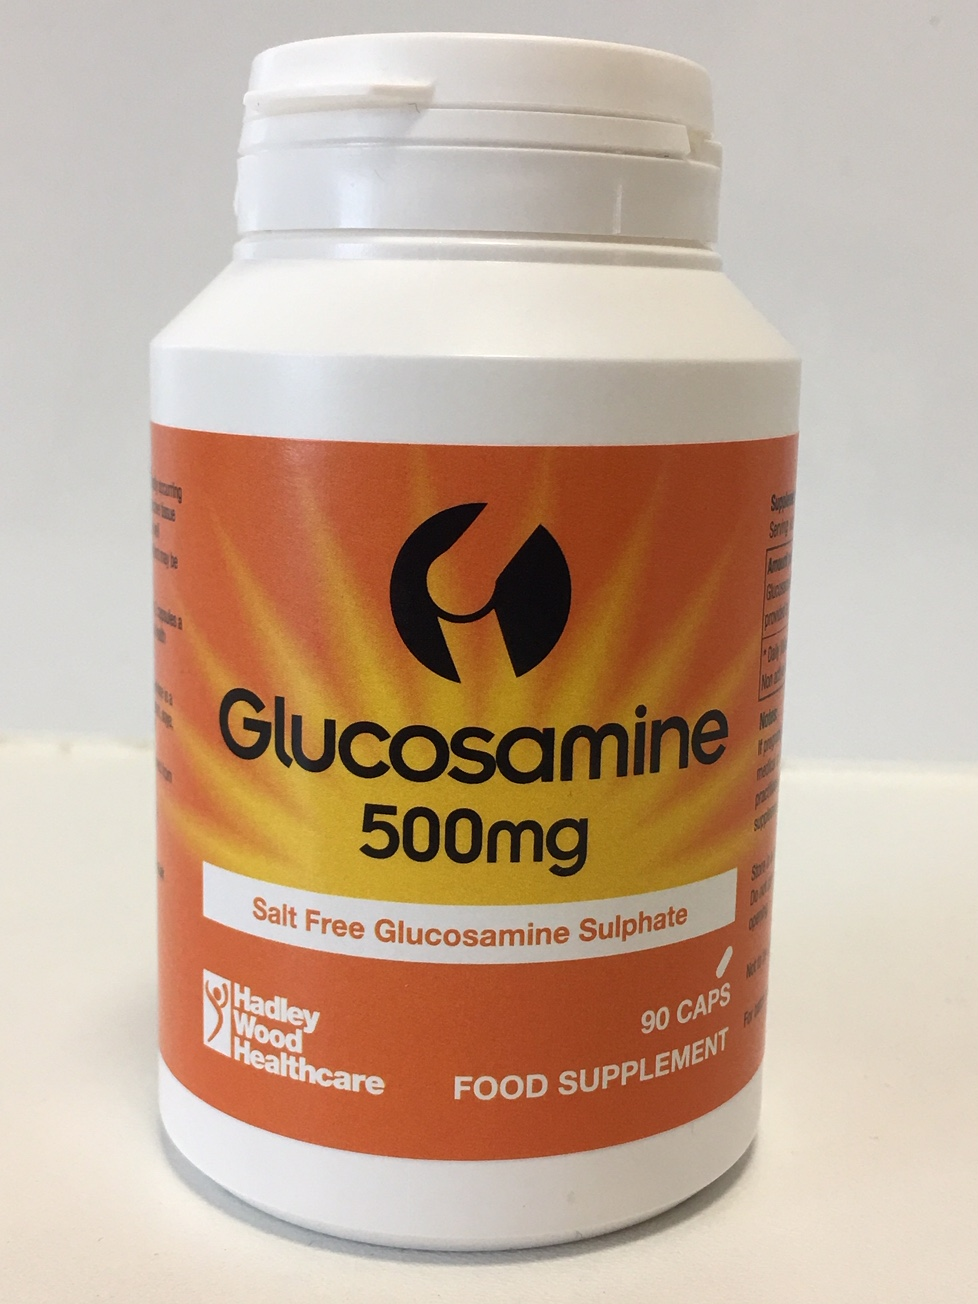 Glucosamine 500mg (Salt Free) 90's